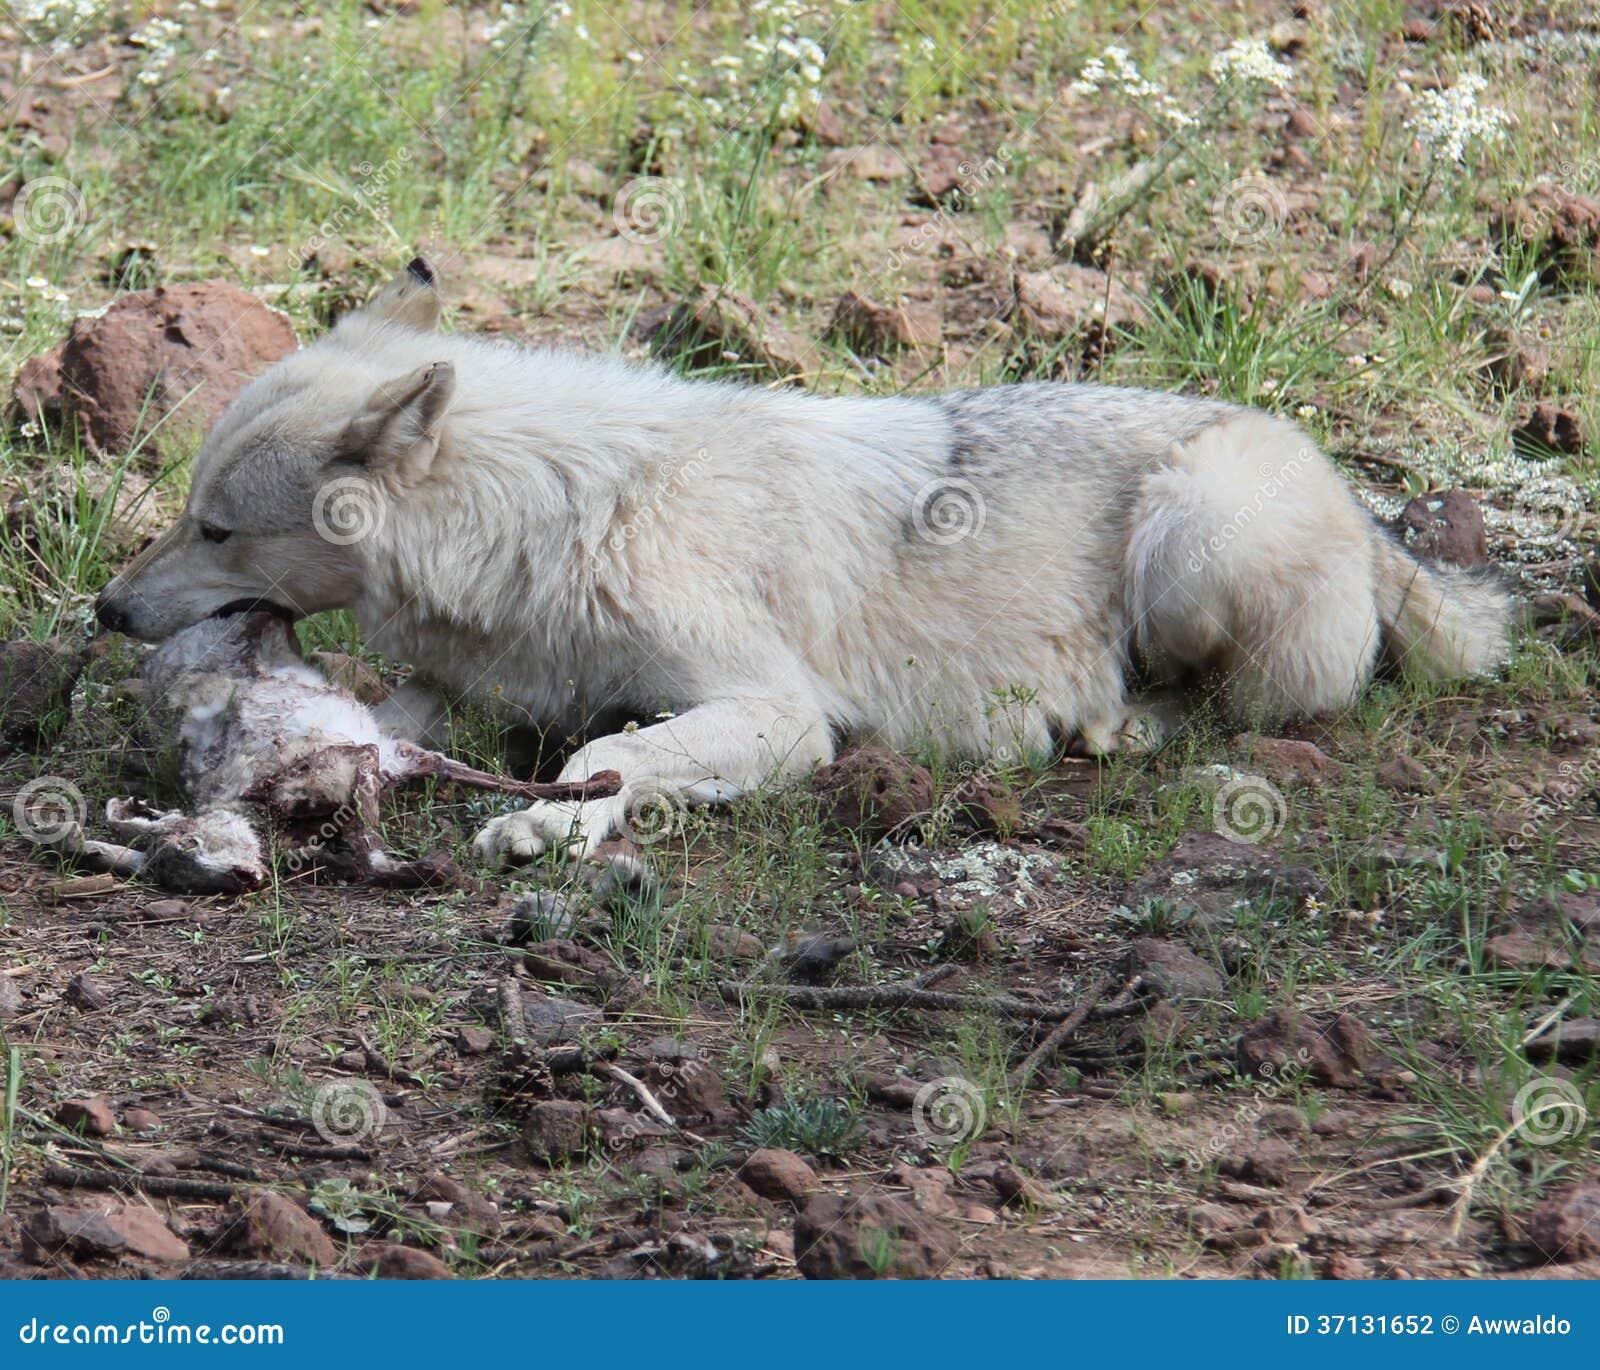 Wolf eating rabbit - photo#13